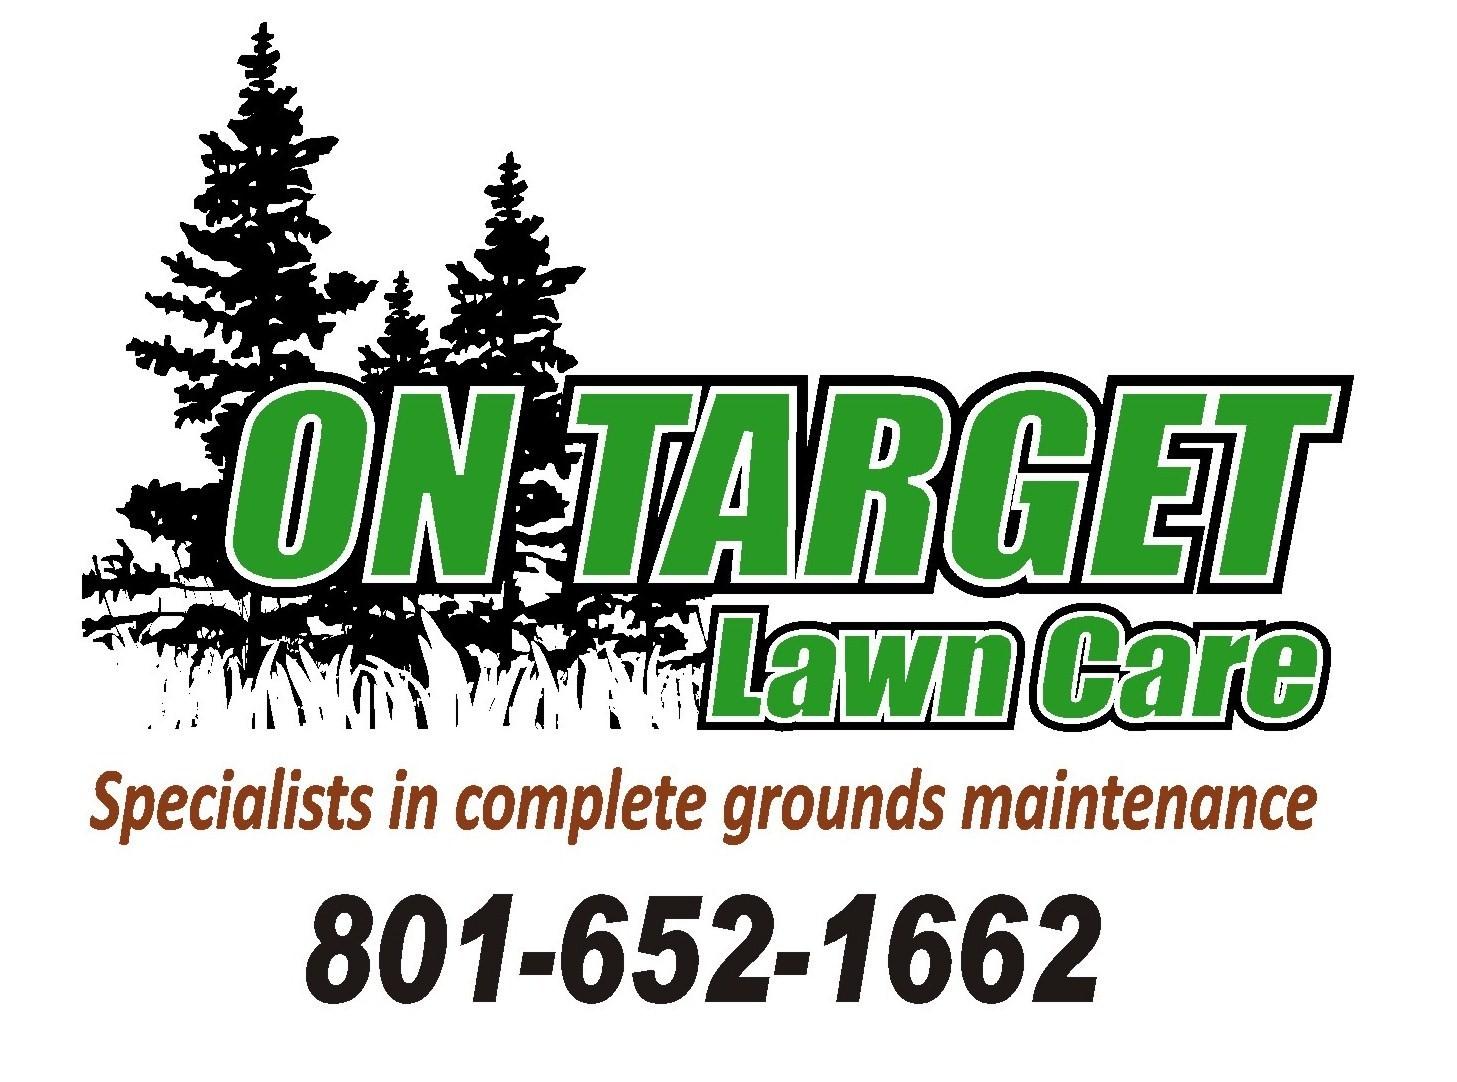 Customized lawn service logo design joy studio design for Garden maintenance logo